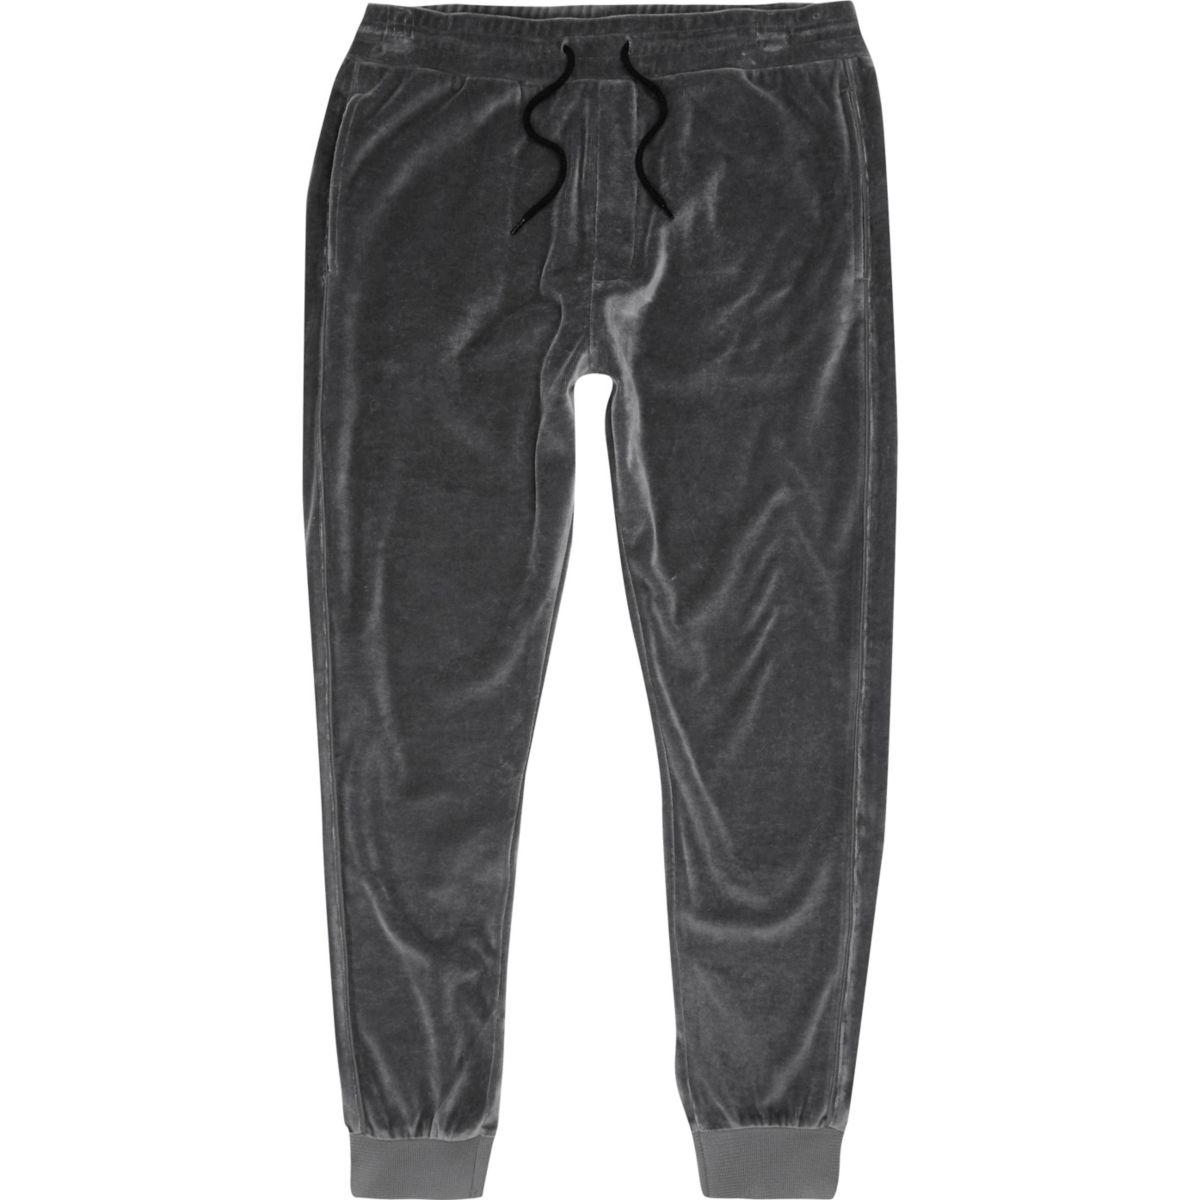 Dark grey velour joggers